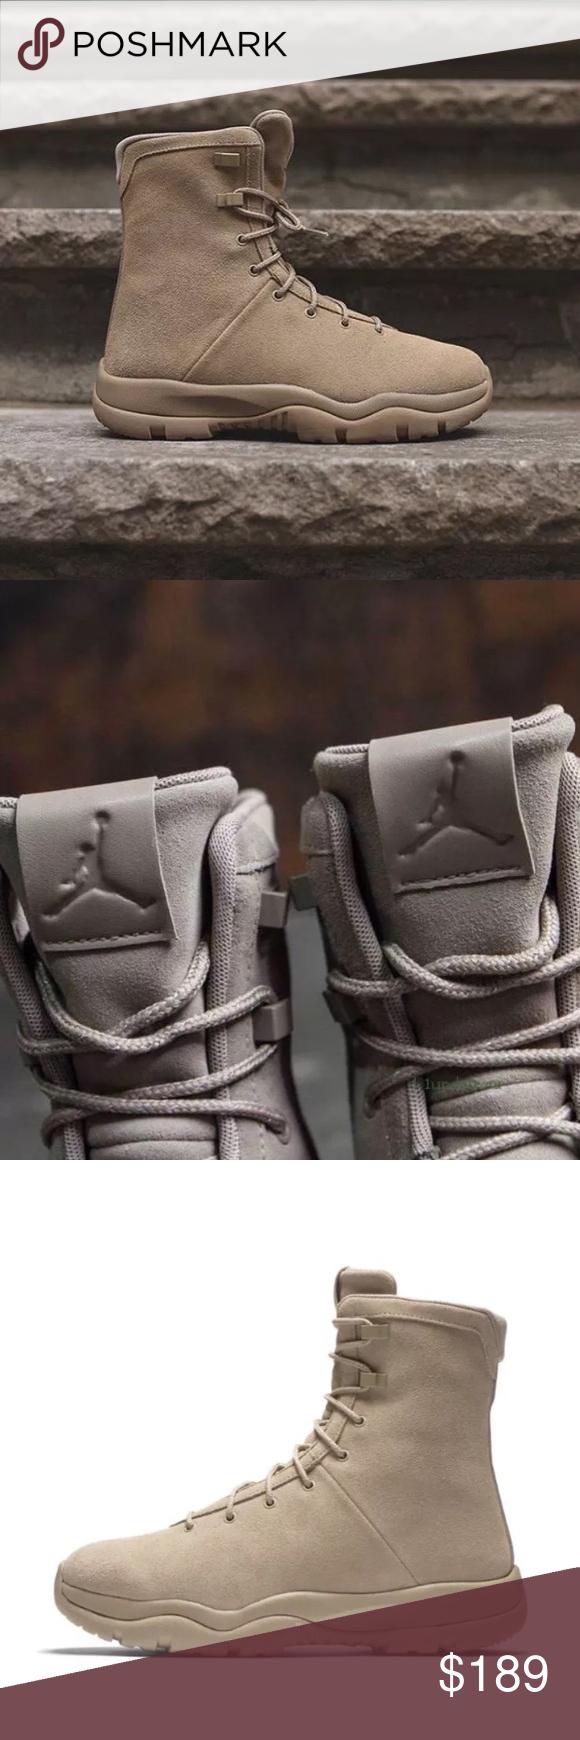 3a2ede76081 Nike Air Jordan Future Boot EP Khaki Suede Tan Brand New without Box ...